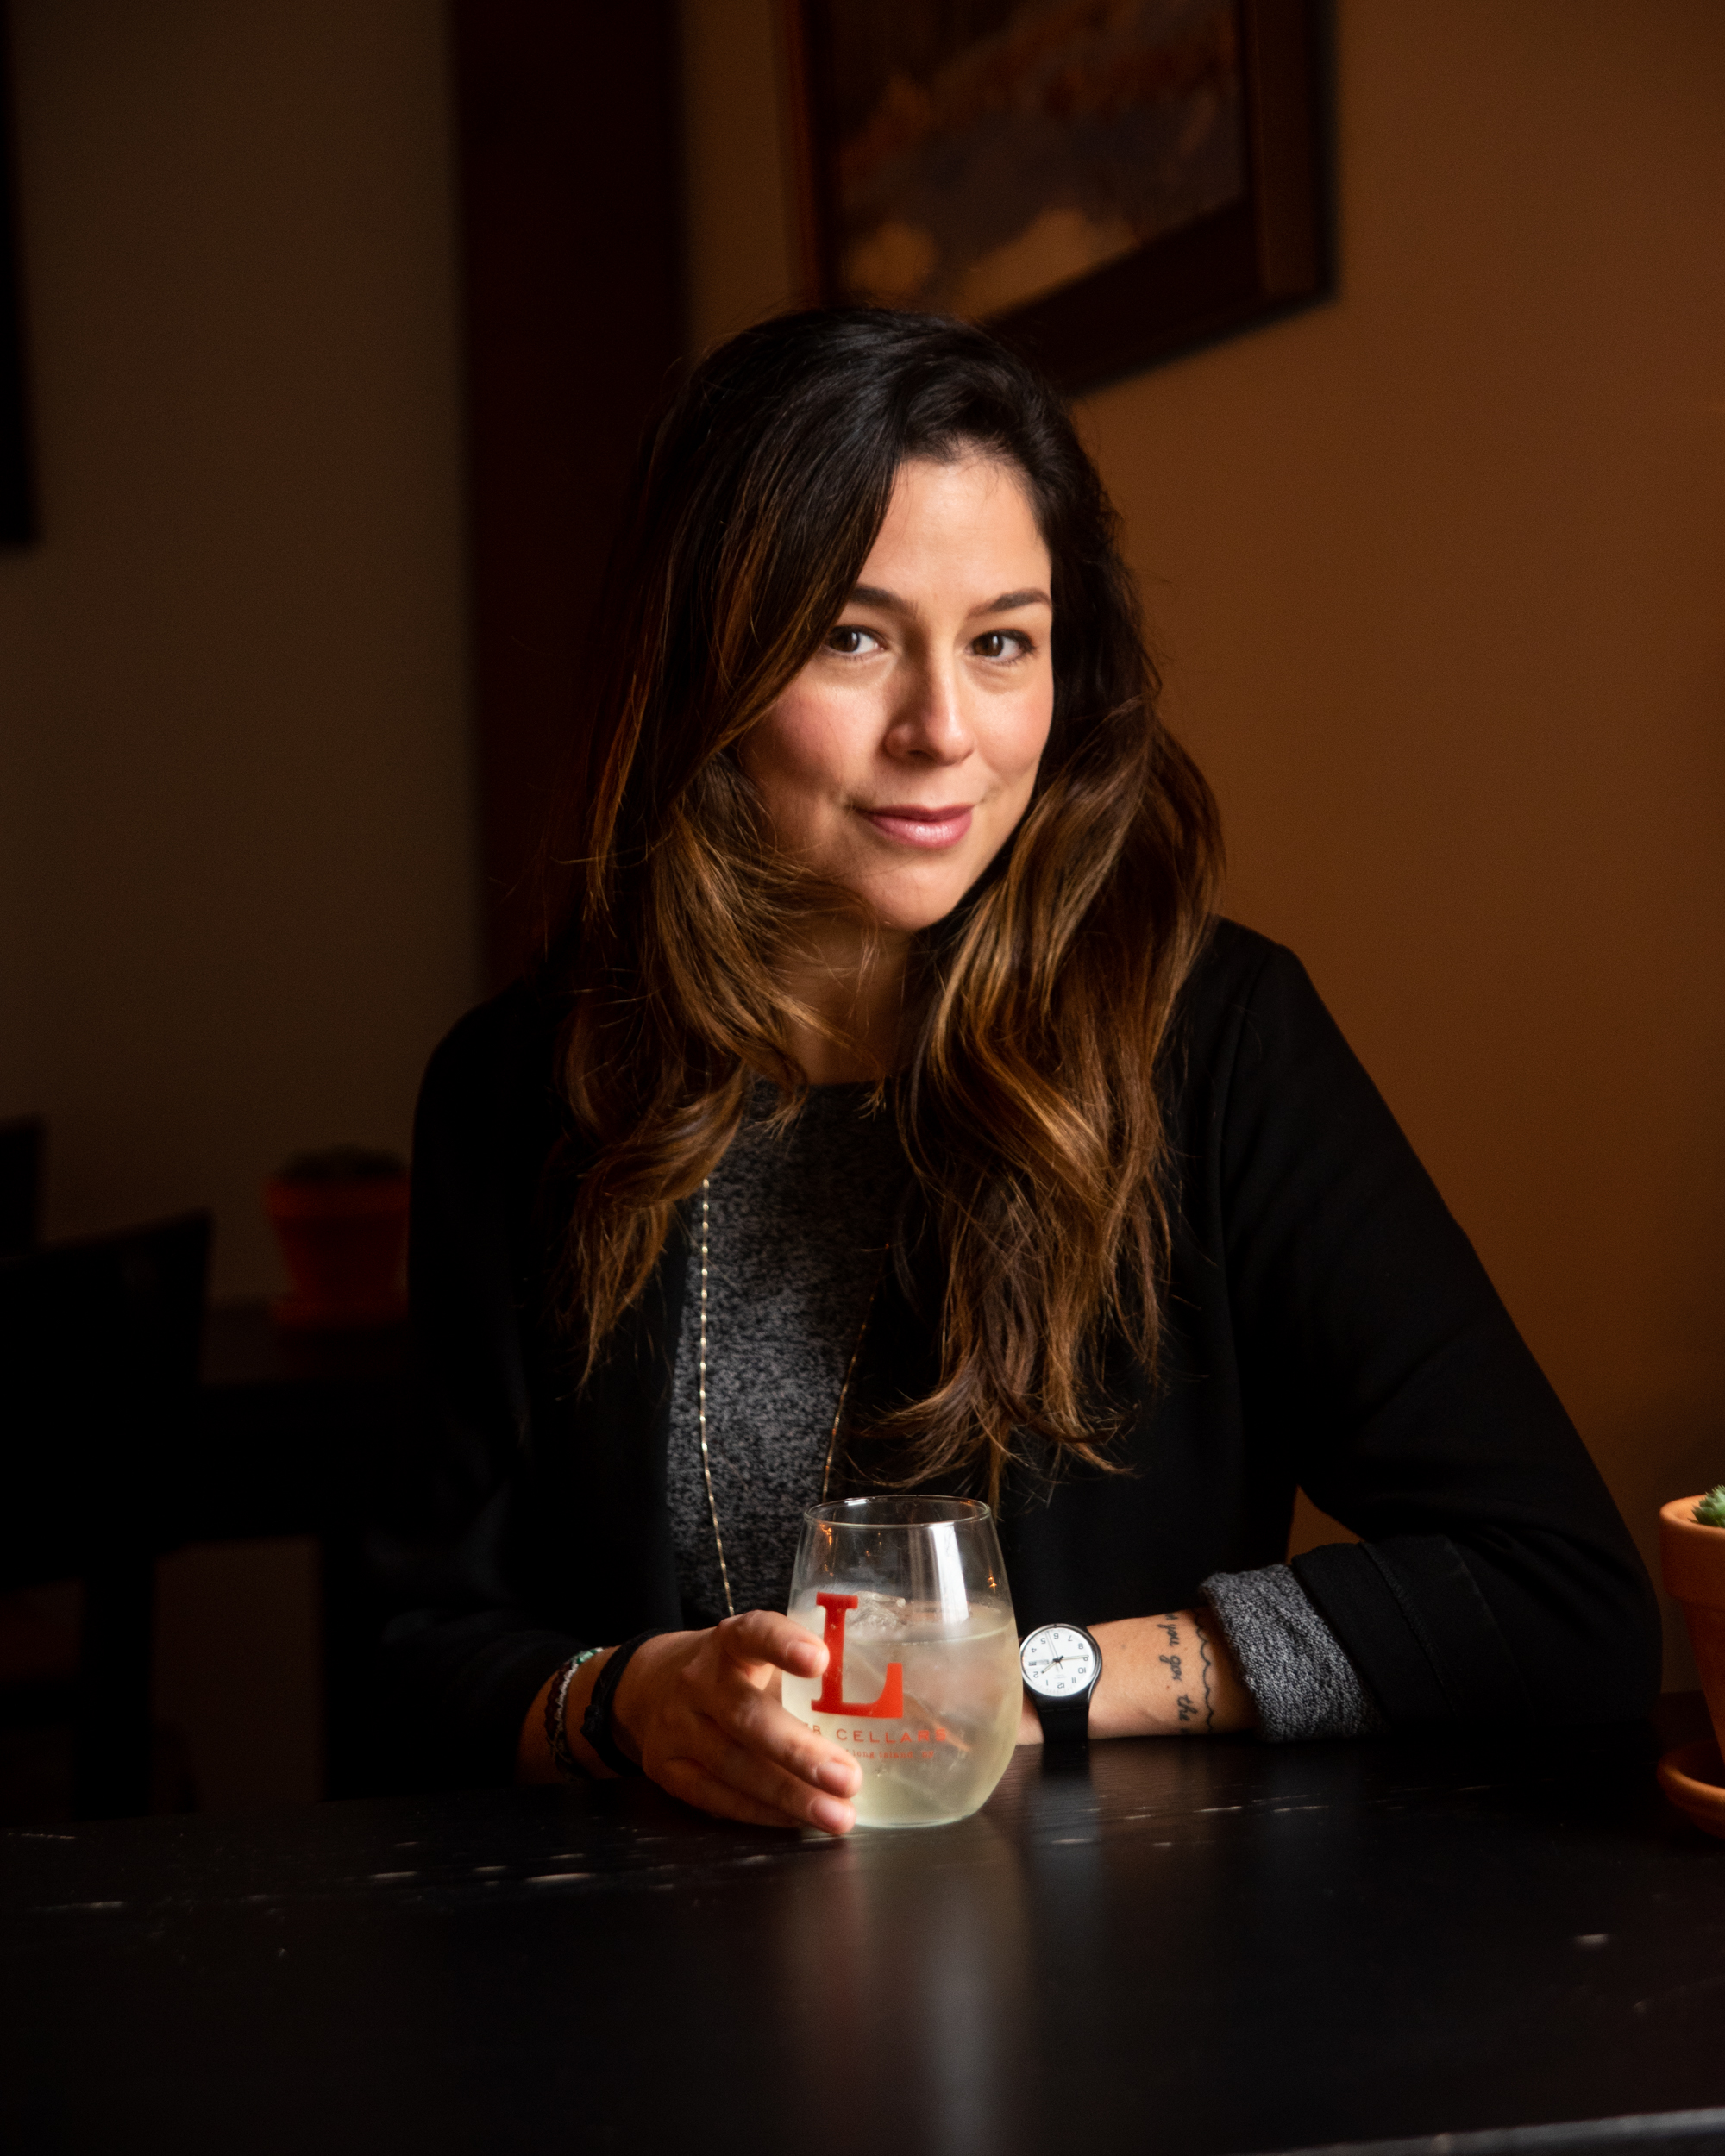 Alicia Ekeler-Valle